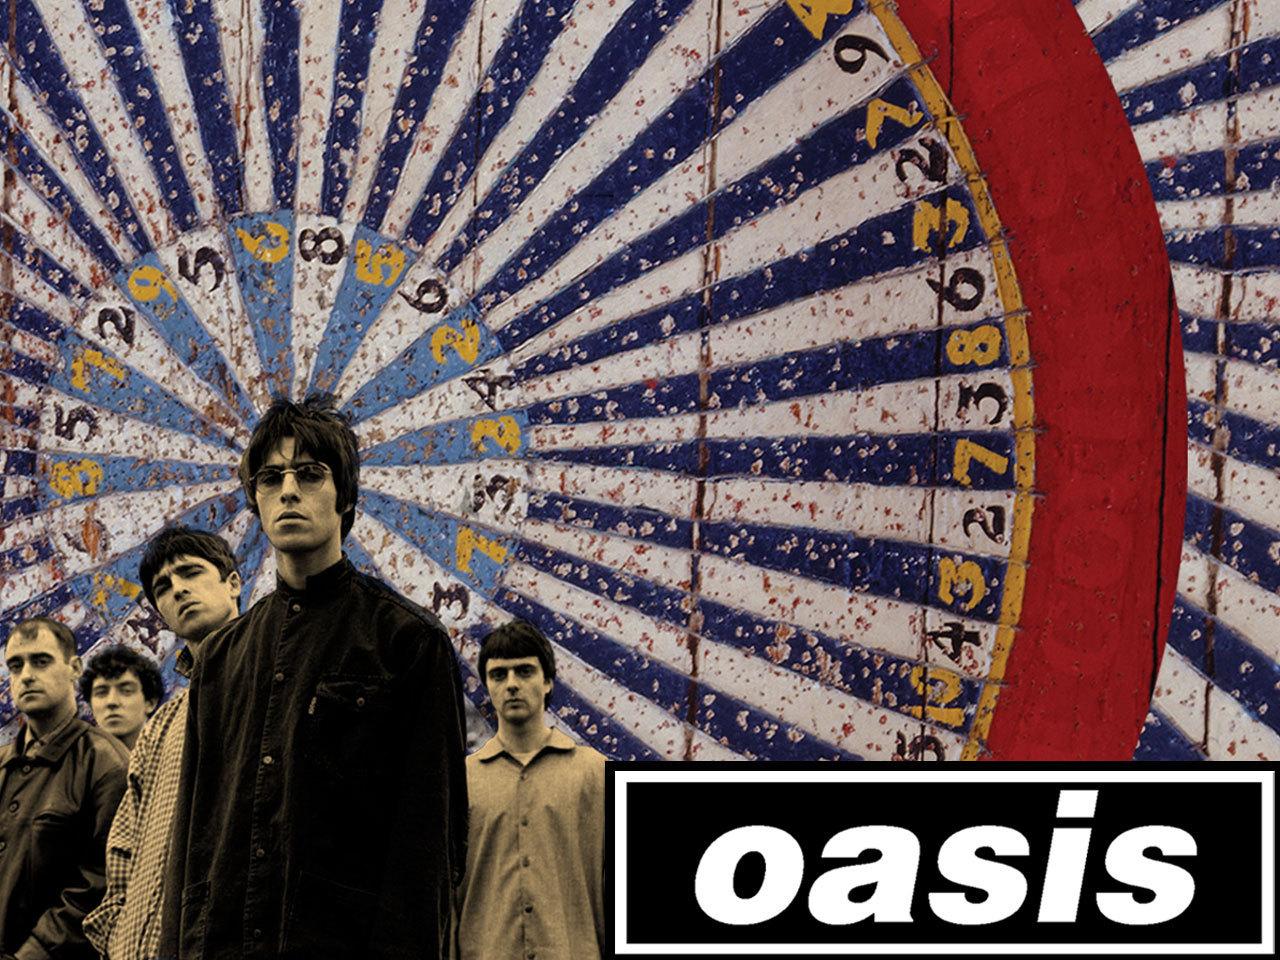 Oasis Wallpaper   Oasis Wallpaper 2352922 1280x960